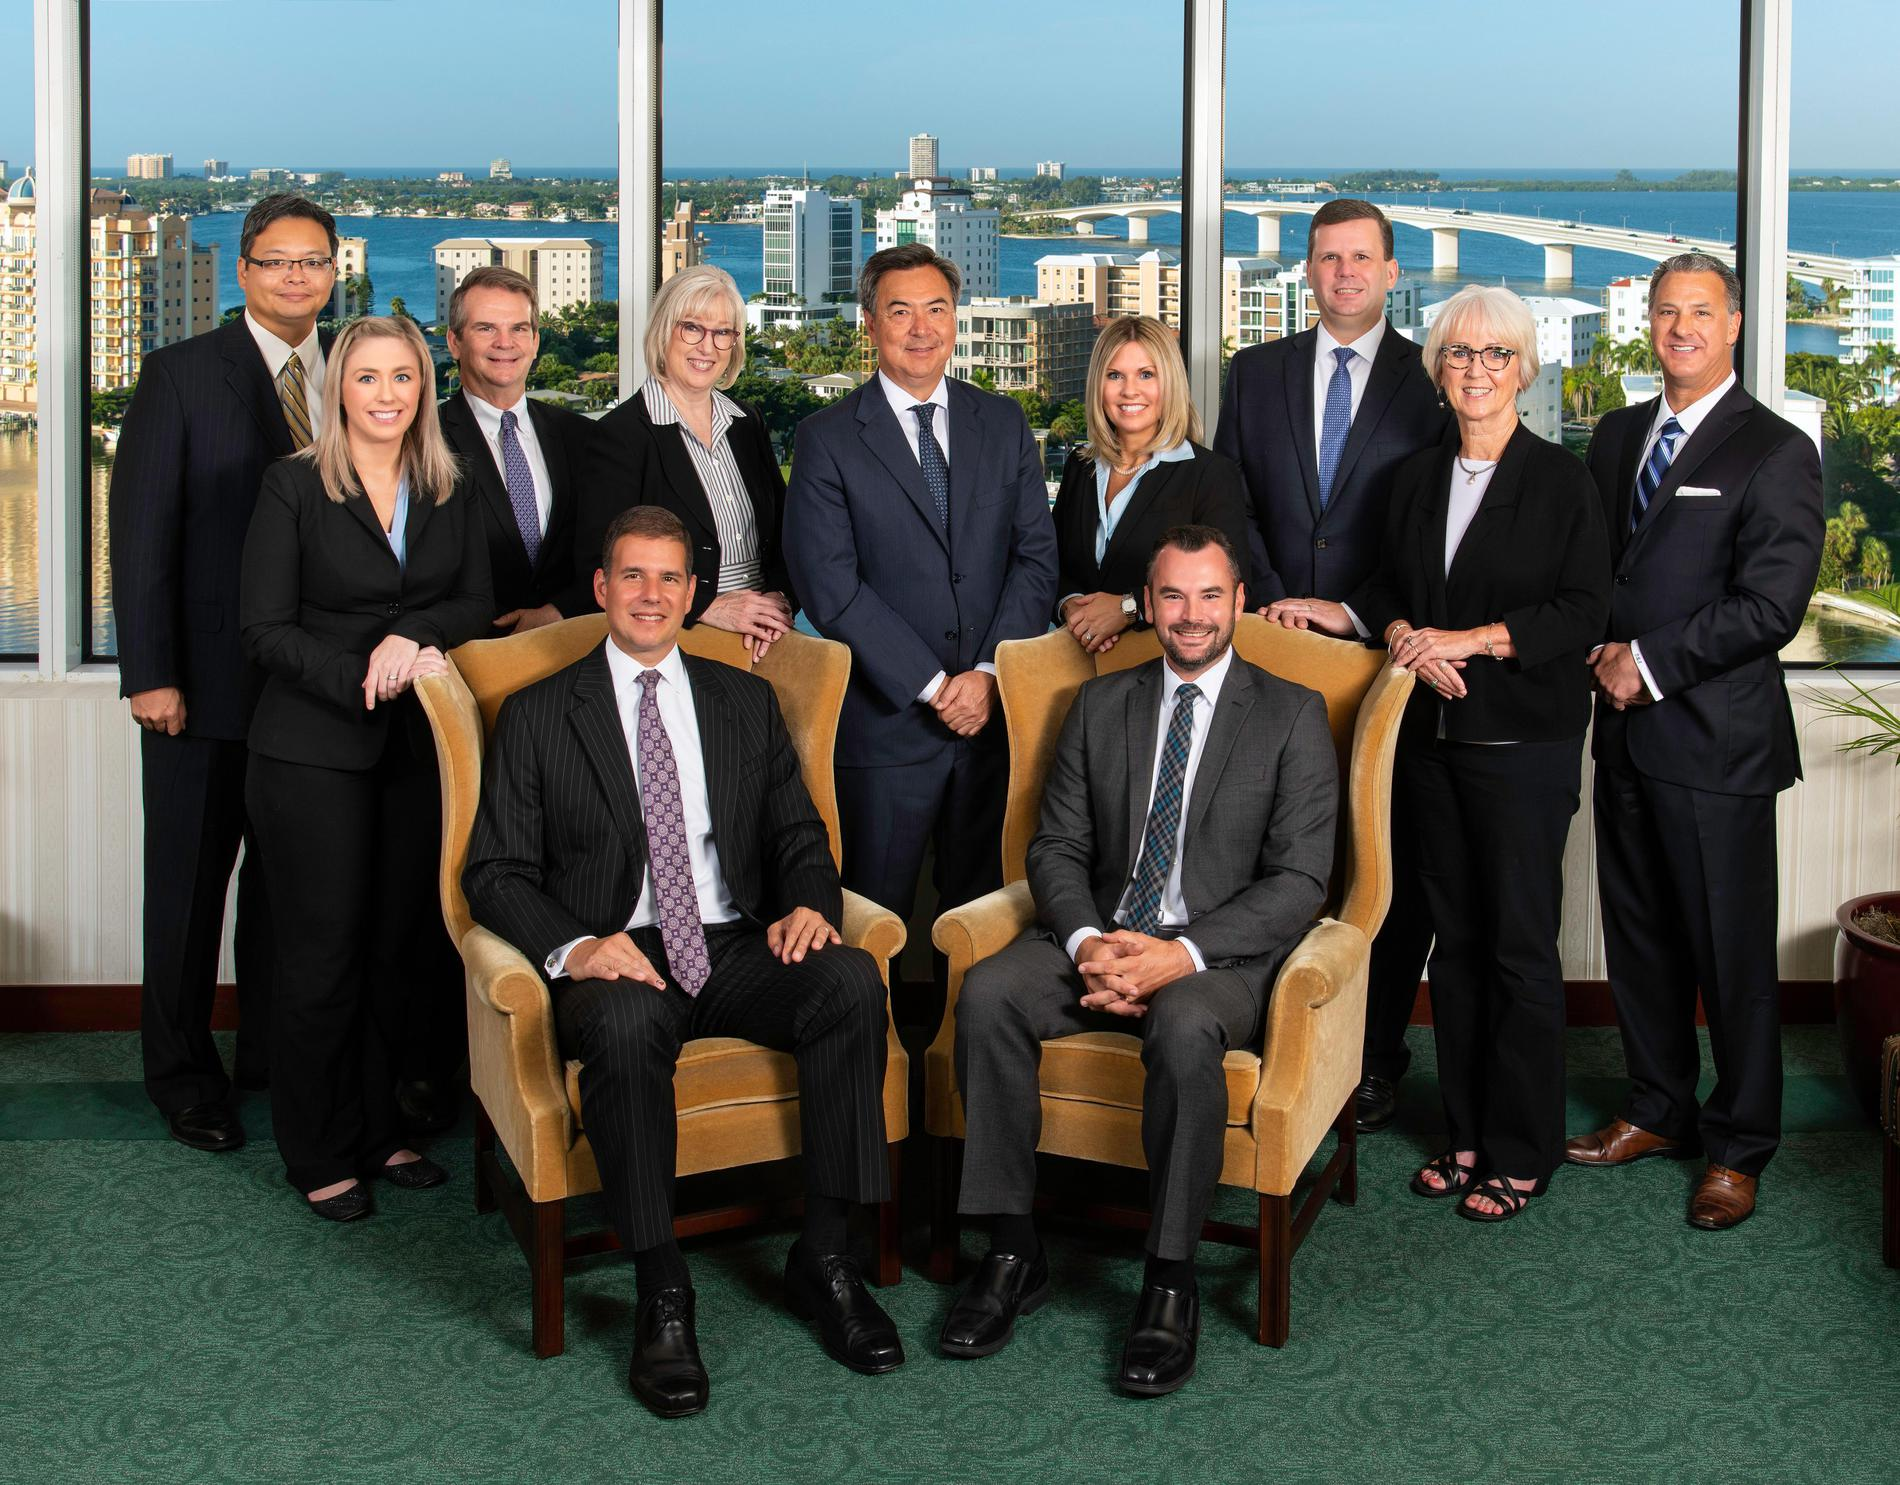 The Sarasota Bay Group | Sarasota, FL | Morgan Stanley Wealth Management